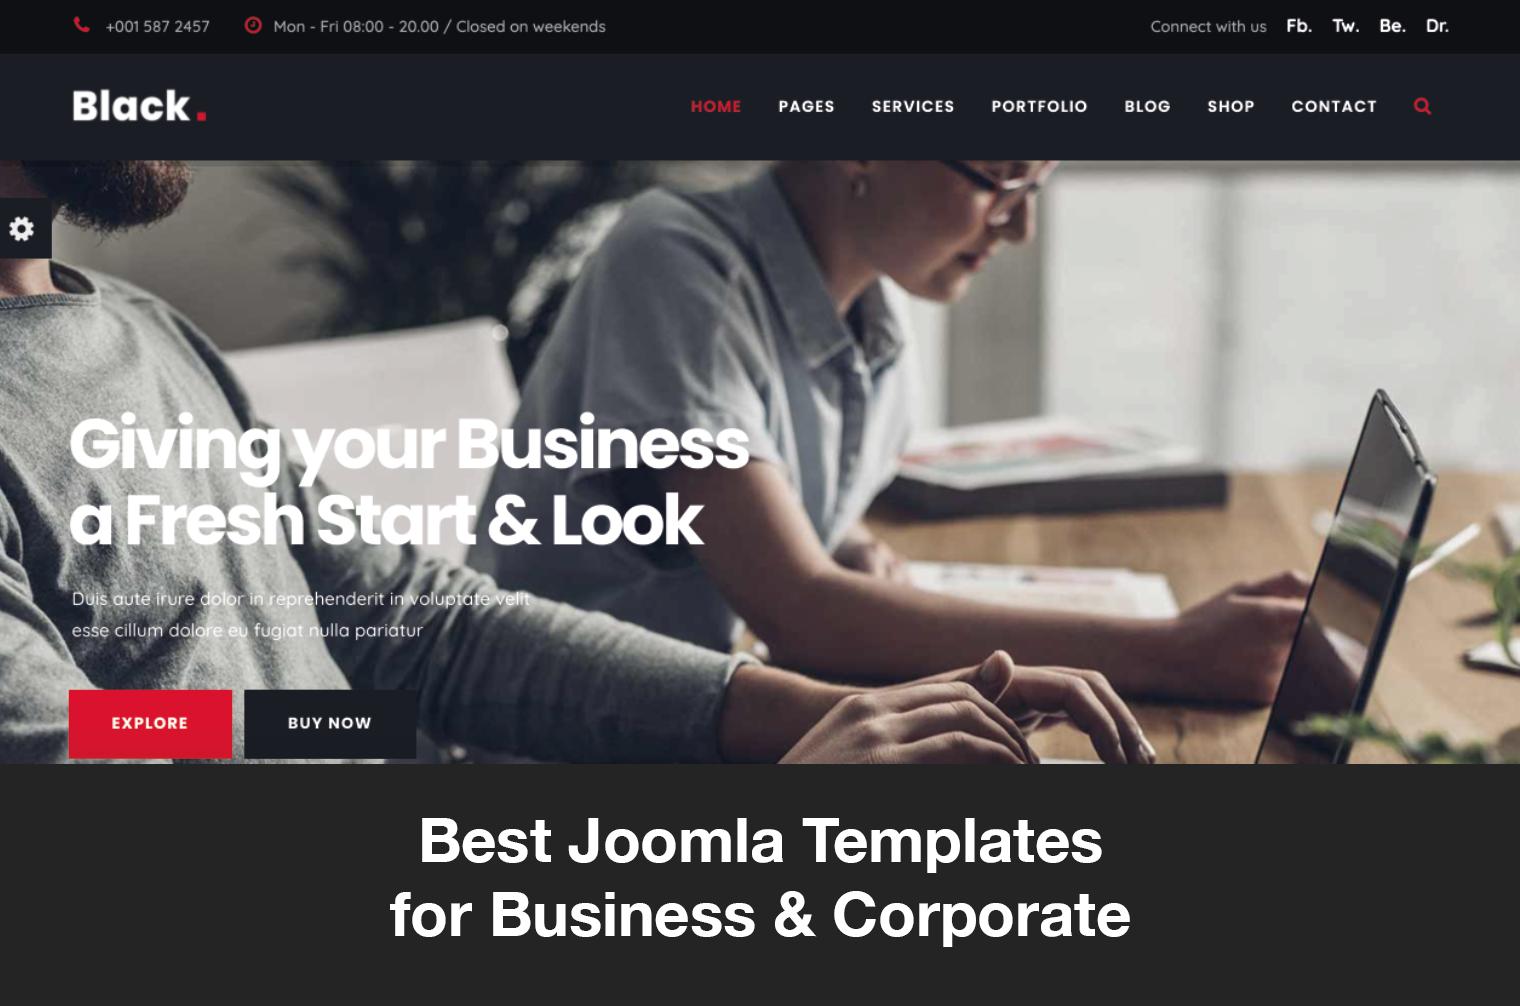 Best Joomla Templates for Business & Corporate